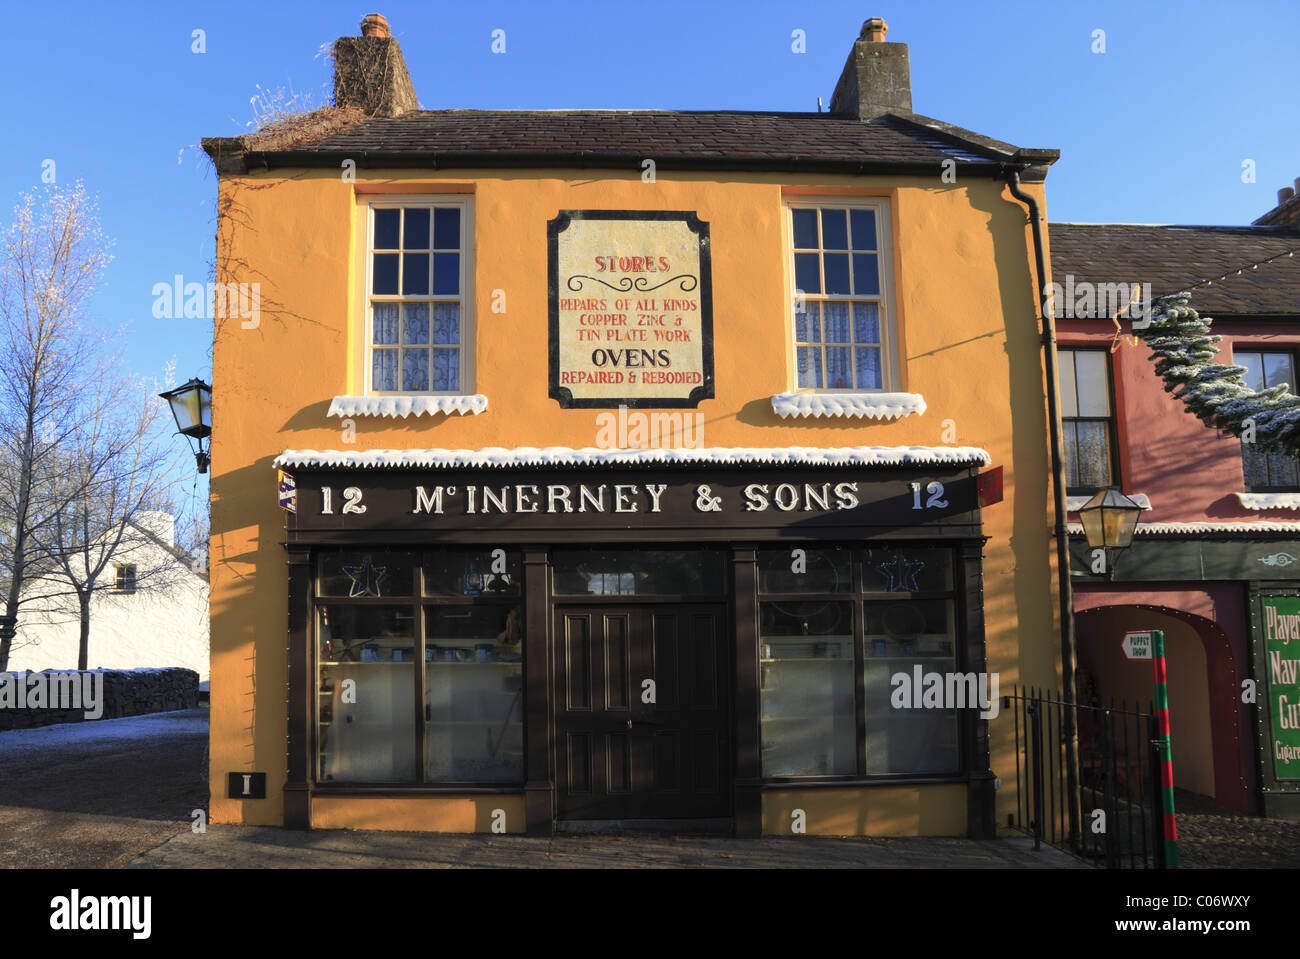 A traditional Irish Shopfront at Bunratty, Co Clare, Rep of Ireland. Stock Photo